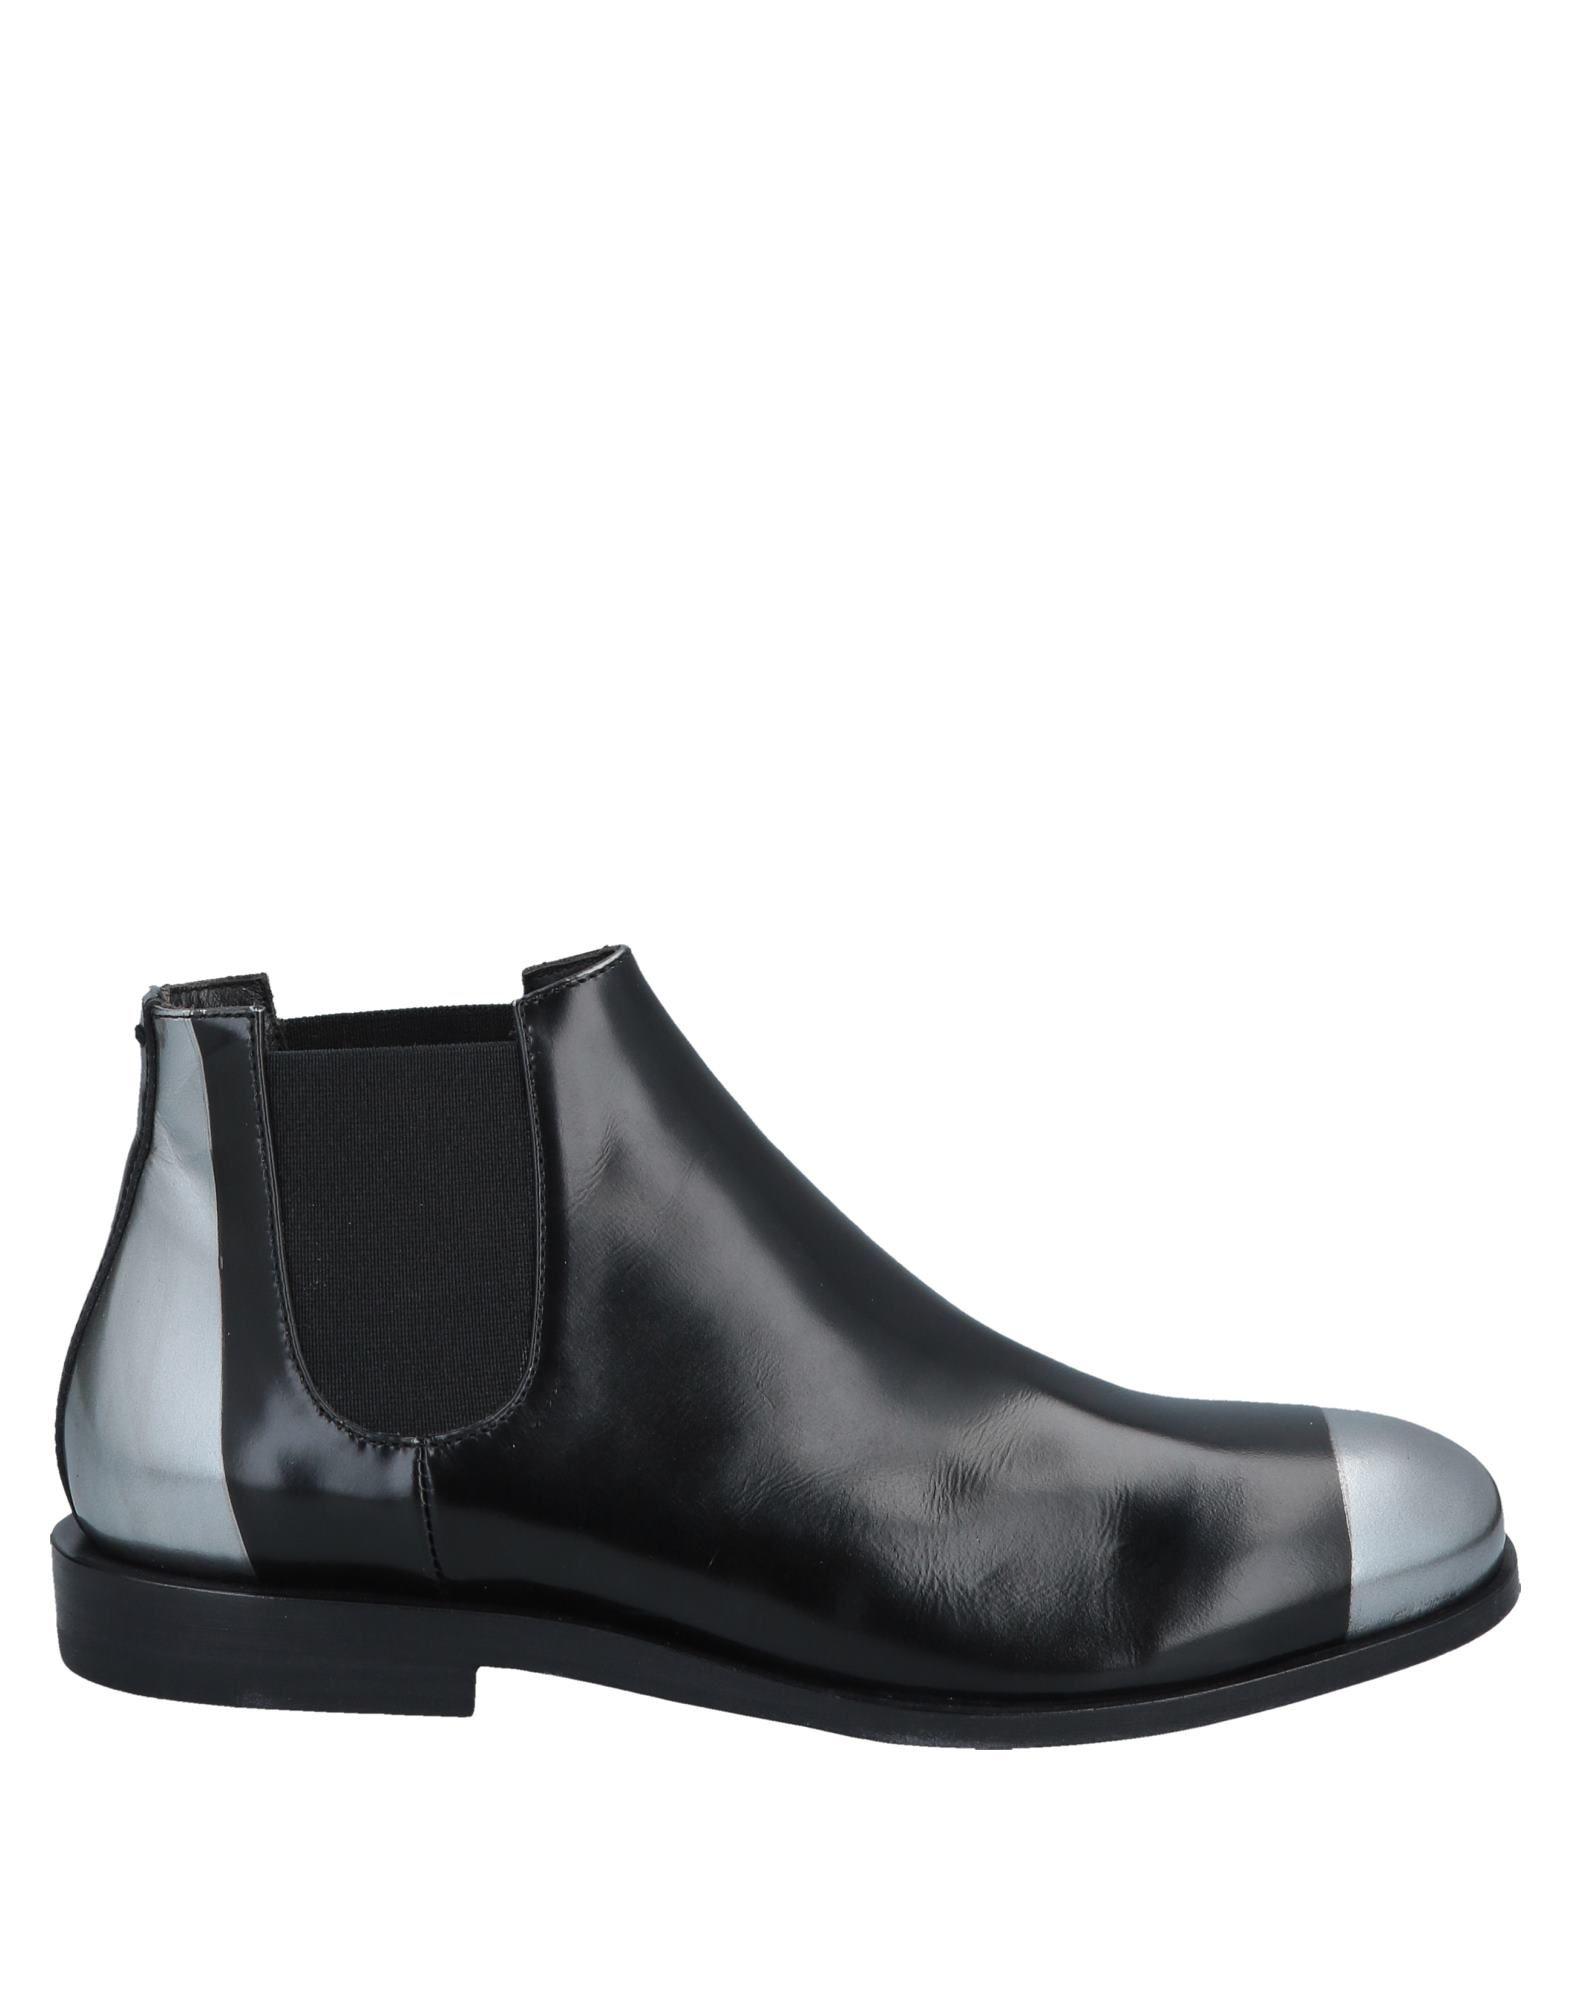 PANTANETTI Полусапоги и высокие ботинки pantanetti полусапоги и высокие ботинки